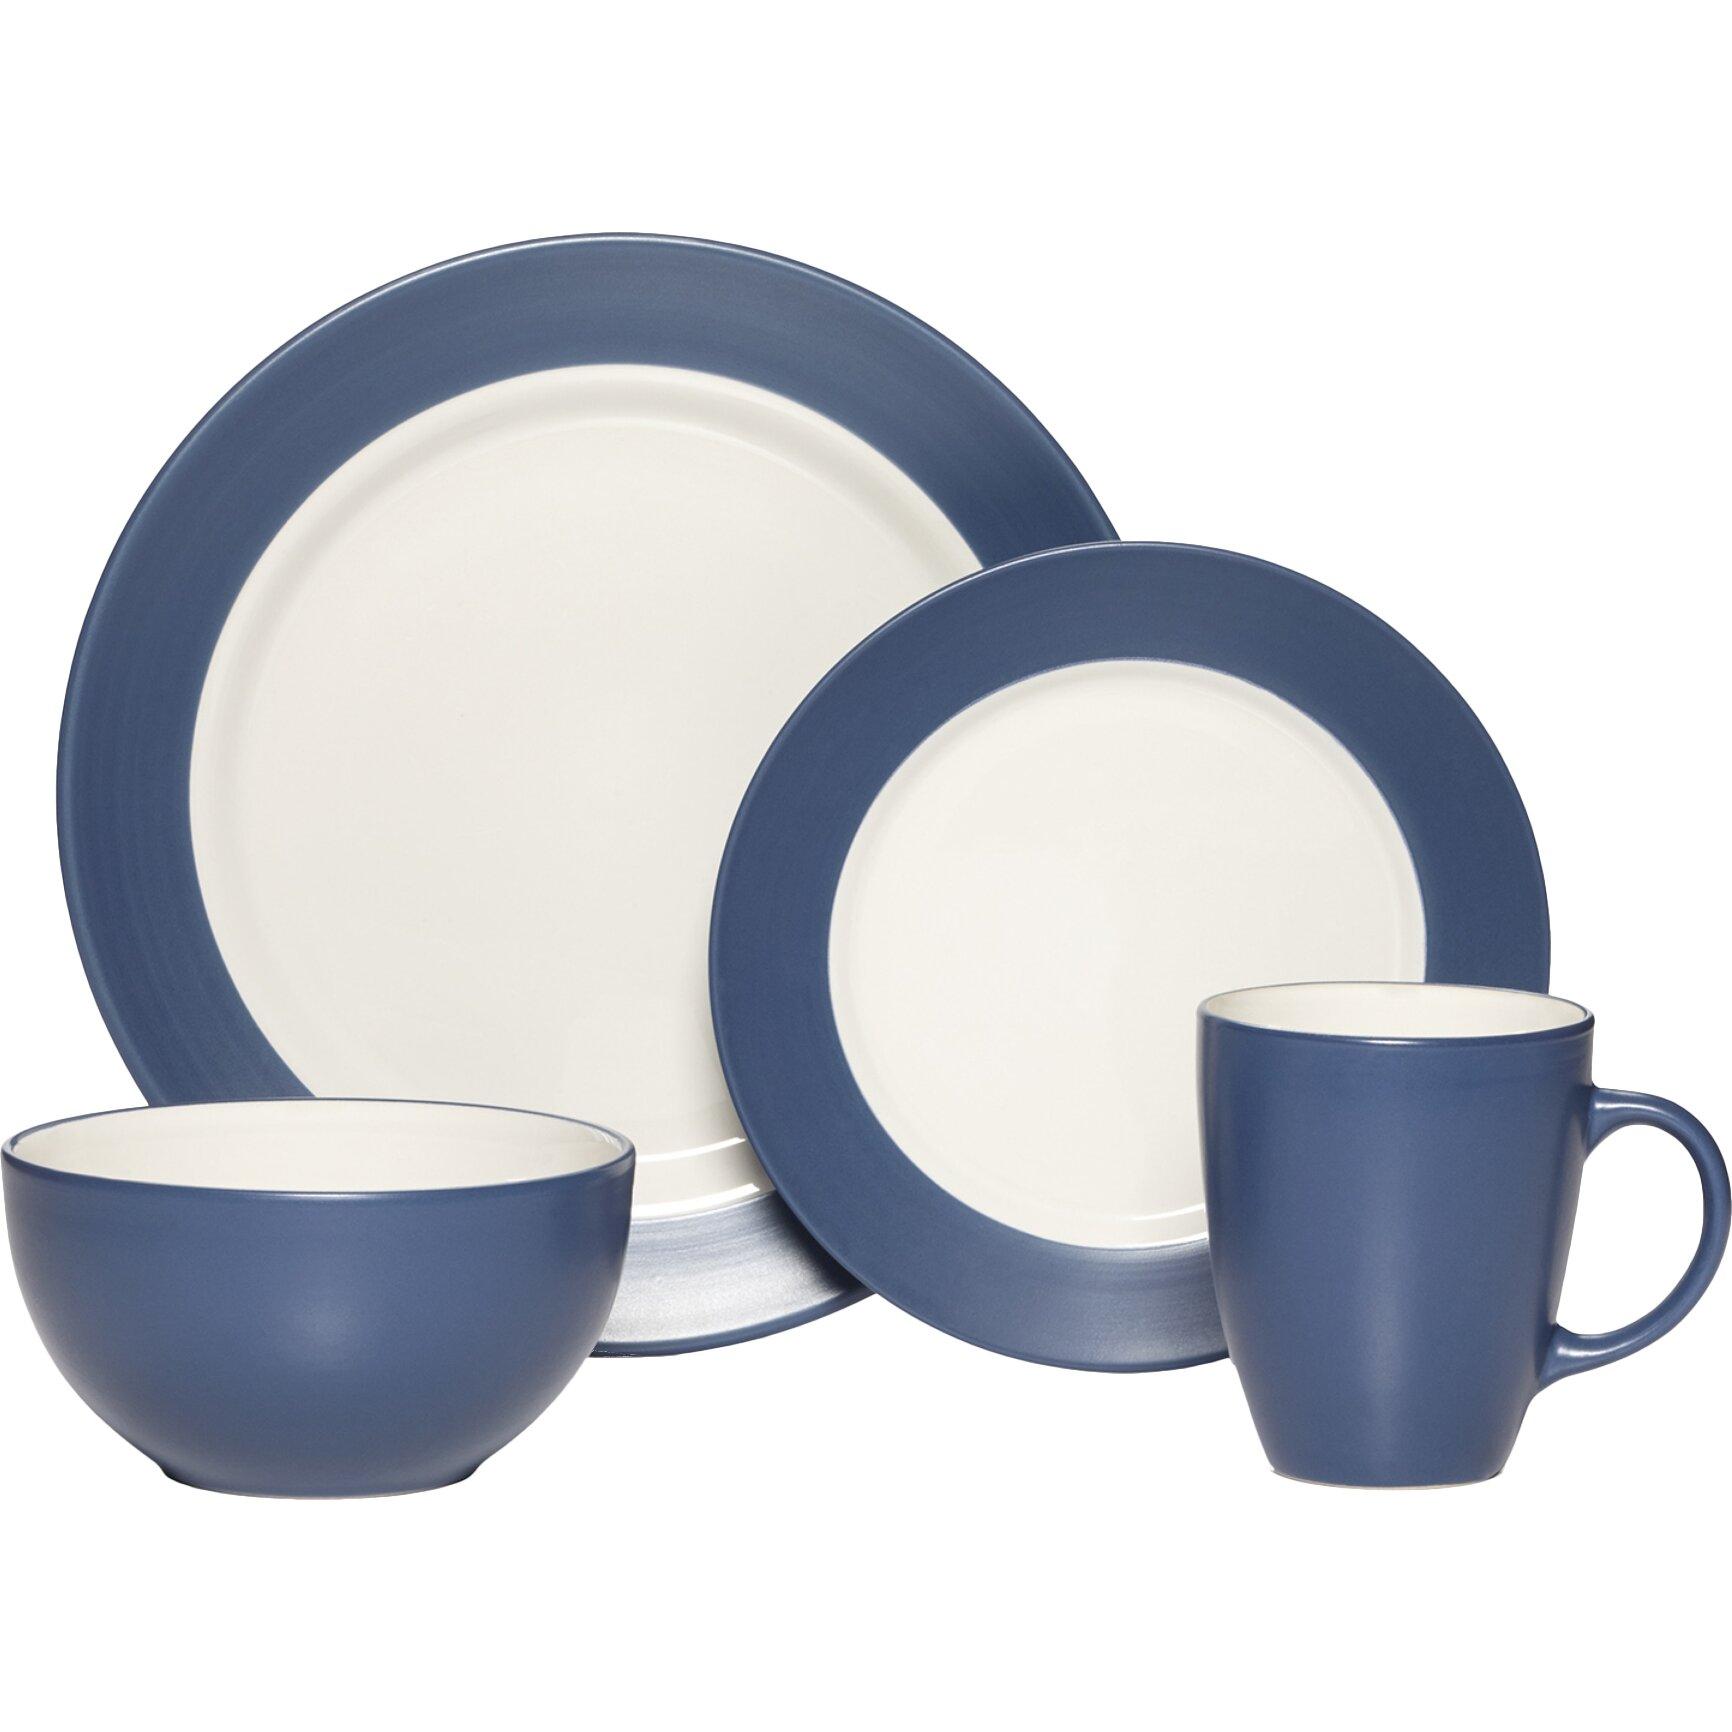 Pfaltzgraff Harmony Everyday 16 Piece Dinnerware Set